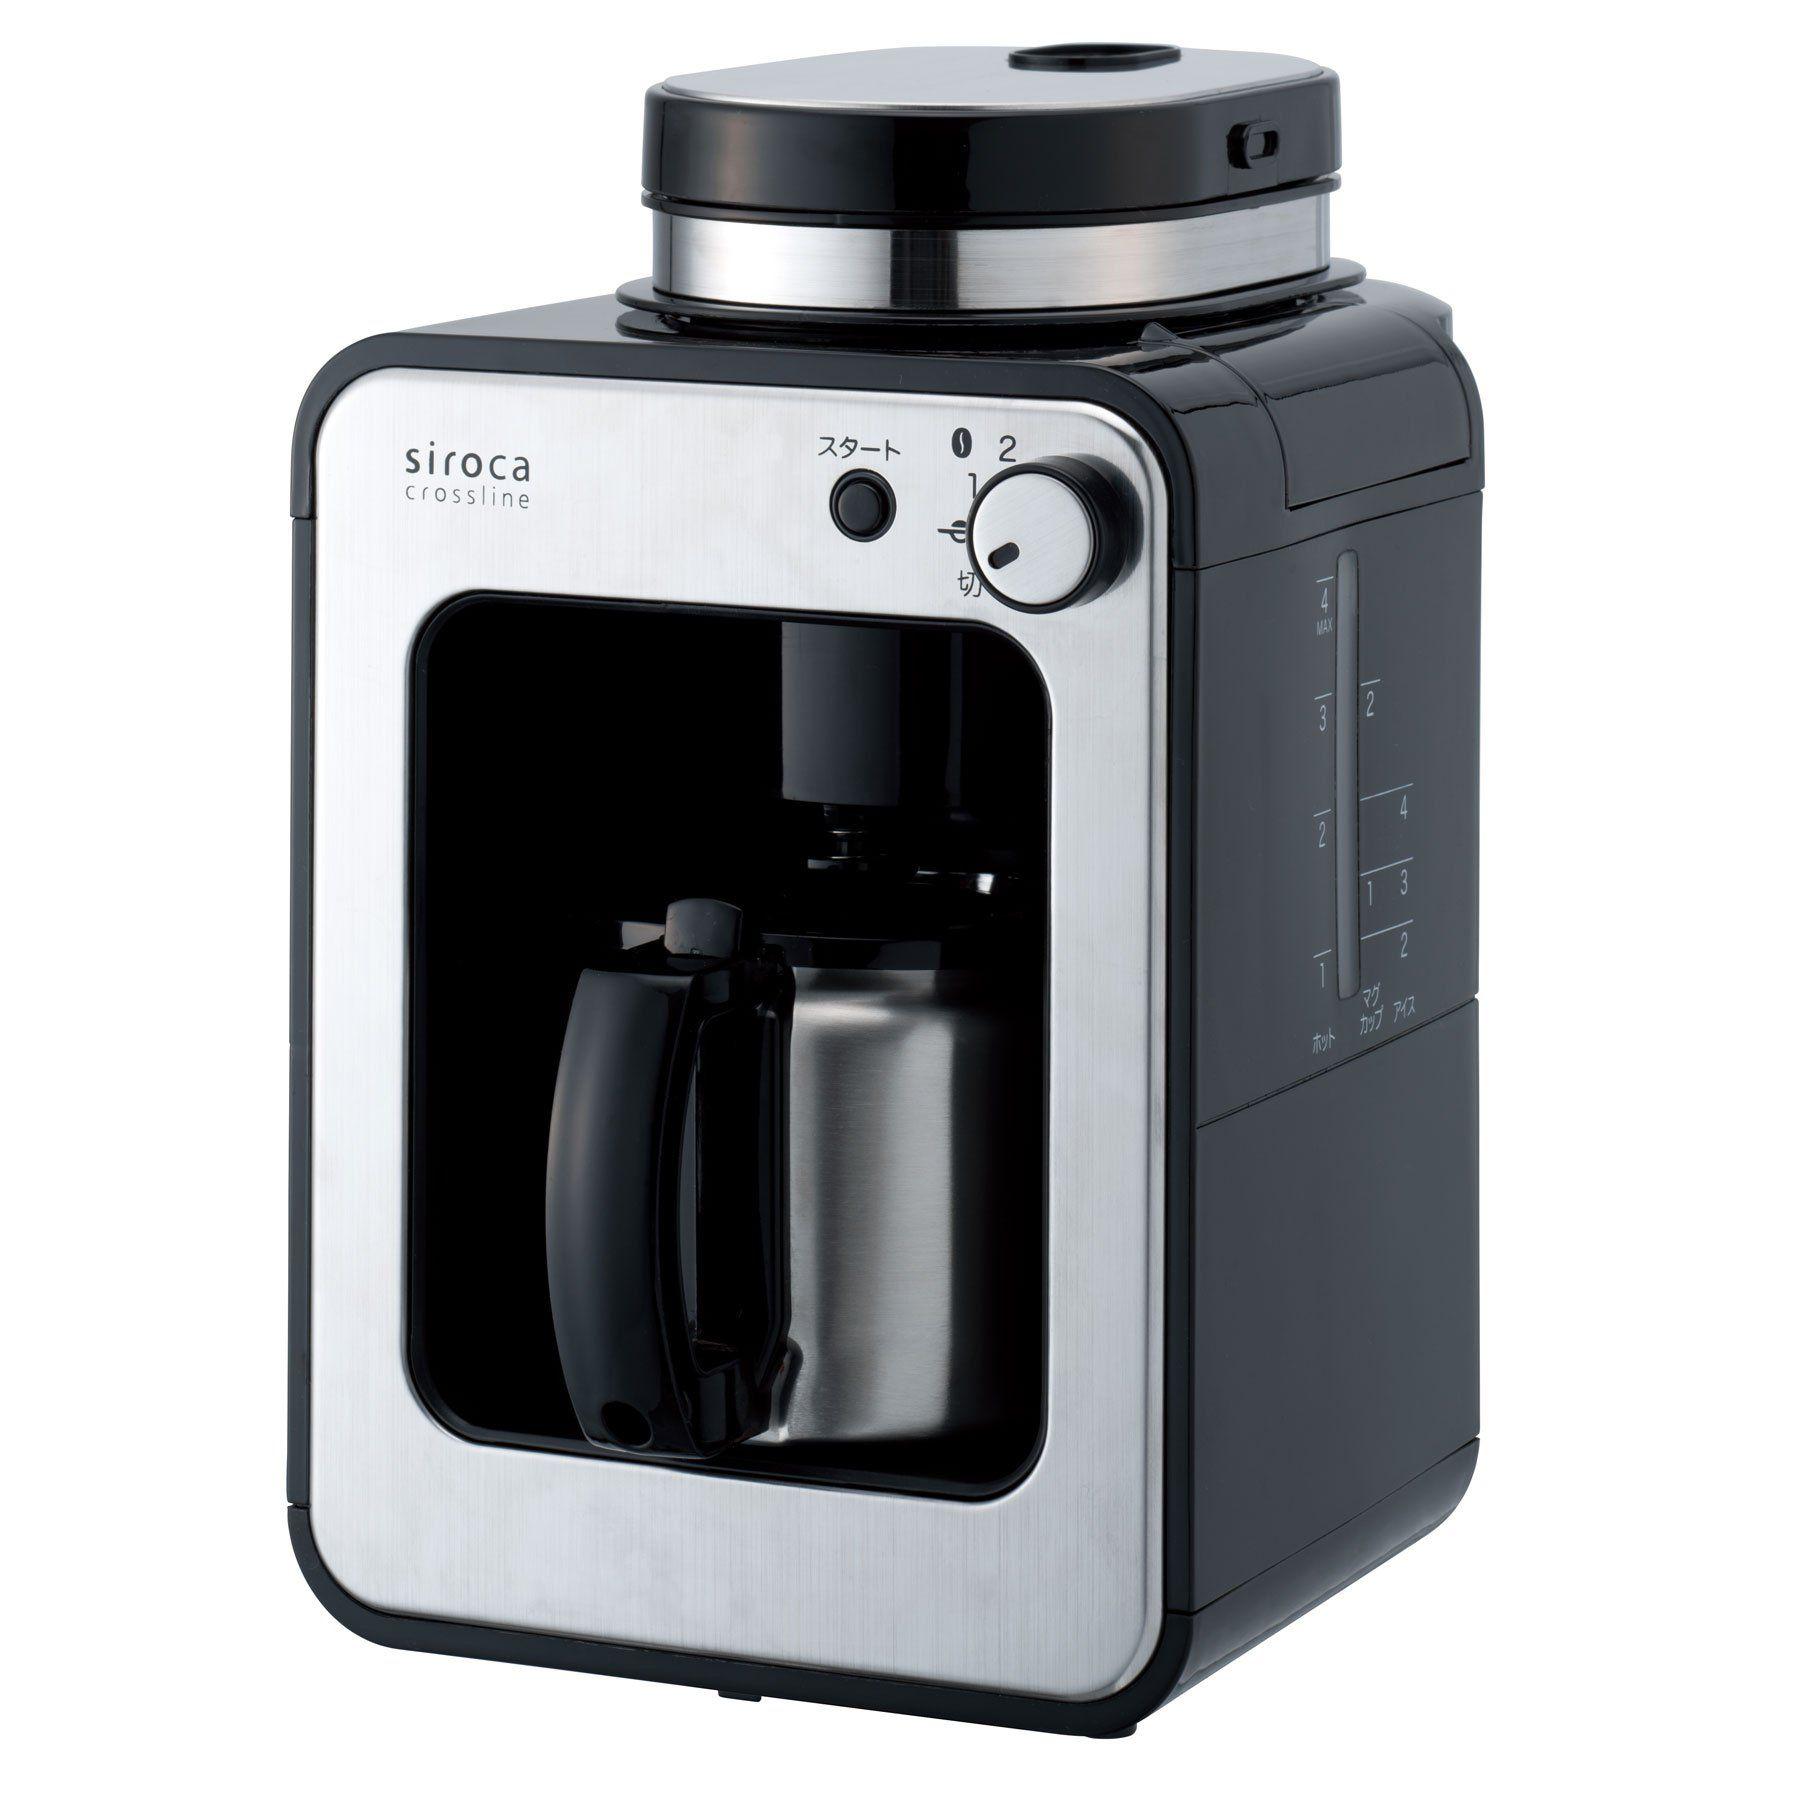 Siroca Crossline 全自動コーヒーメーカー Stc 501 コーヒーメーカー コーヒー コーヒーサーバー